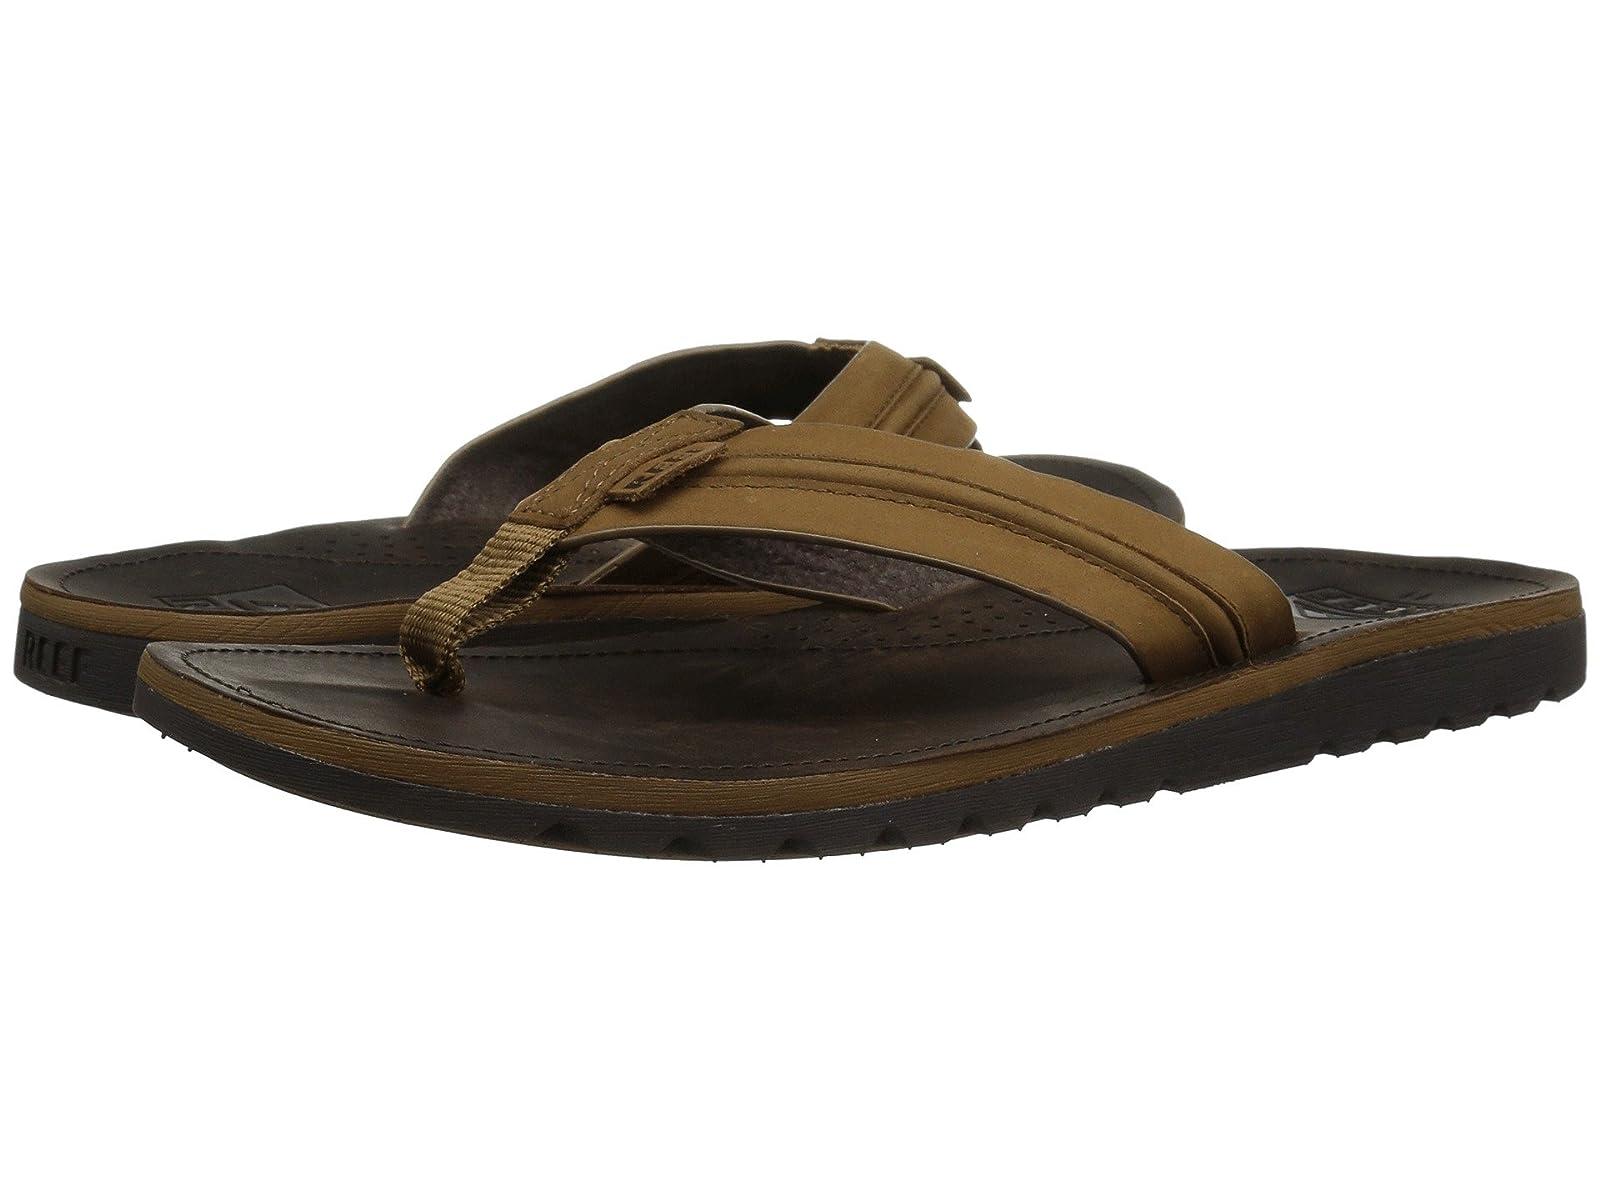 Reef Voyage LuxAtmospheric grades have affordable shoes